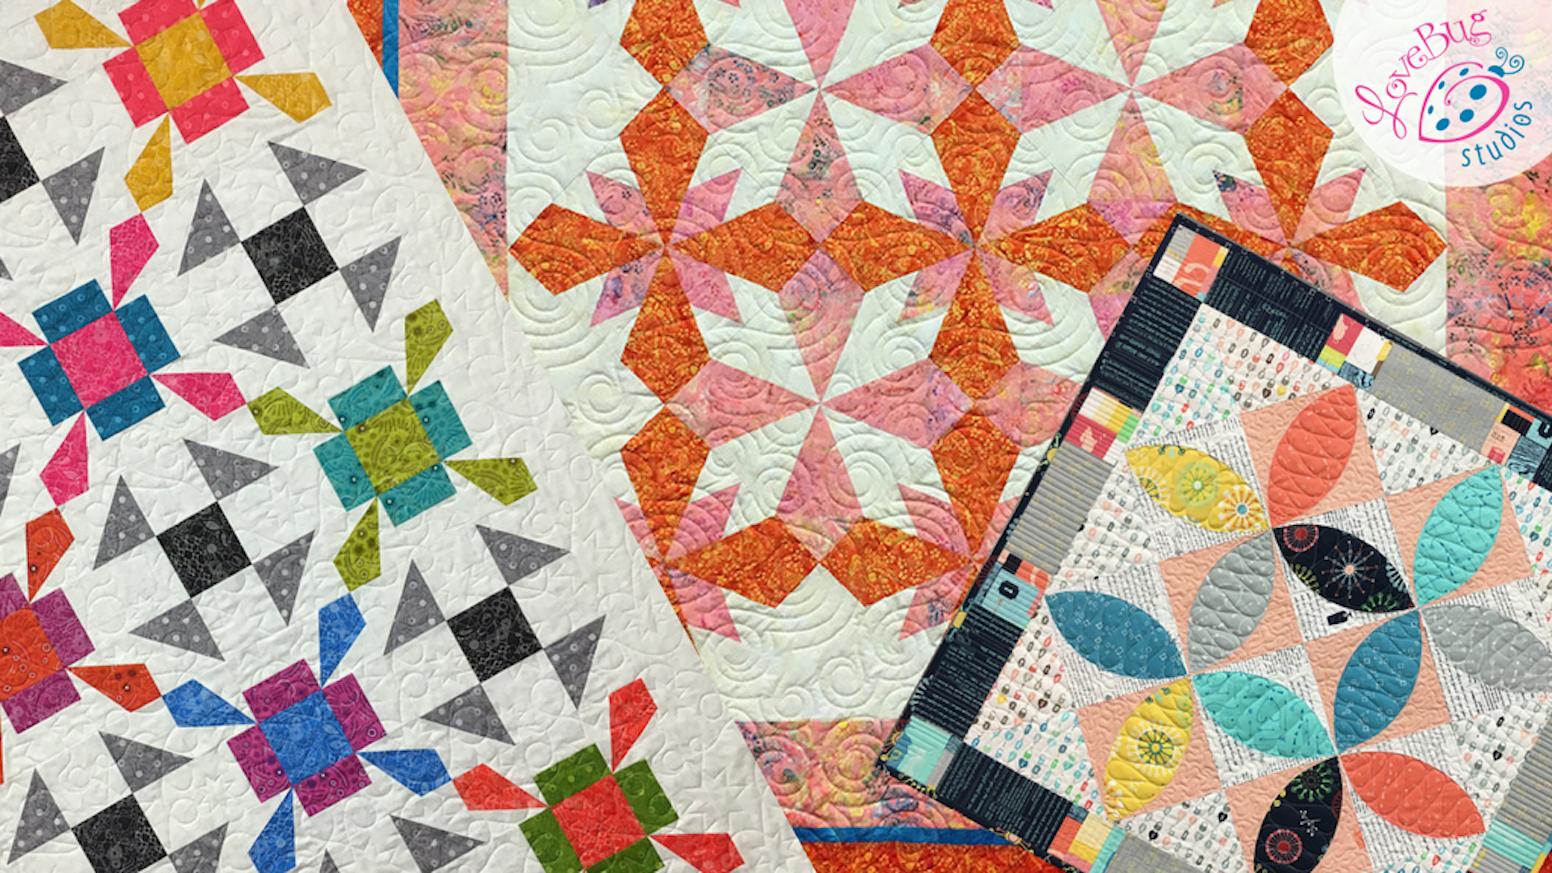 Exclusive Fabric Cutting Dies By Lovebug Studios By Ebony Love